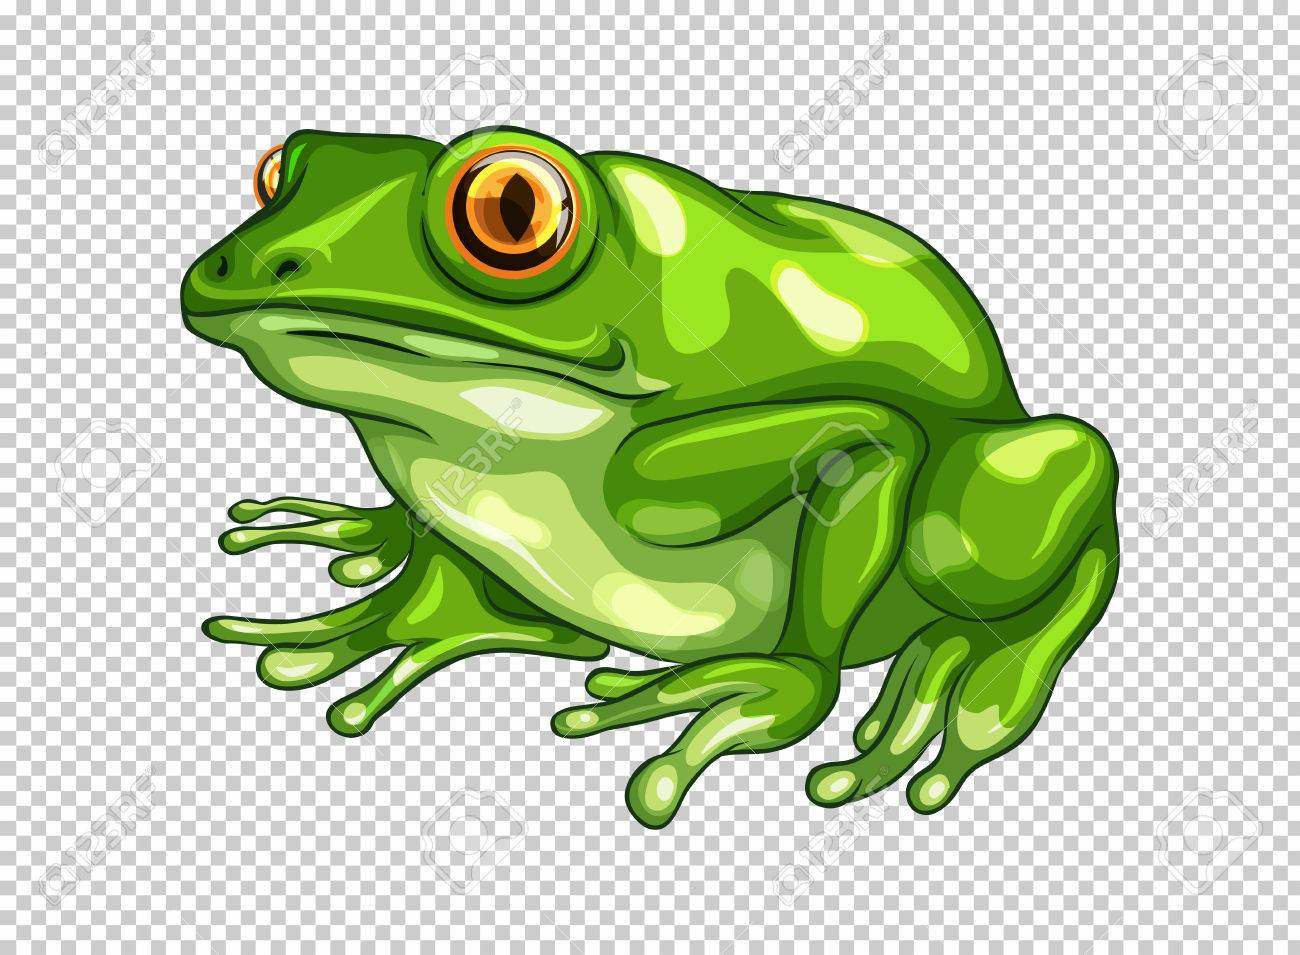 green frog on transparent background illustration royalty free rh 123rf com clipart transparent background clip art with transparent background free